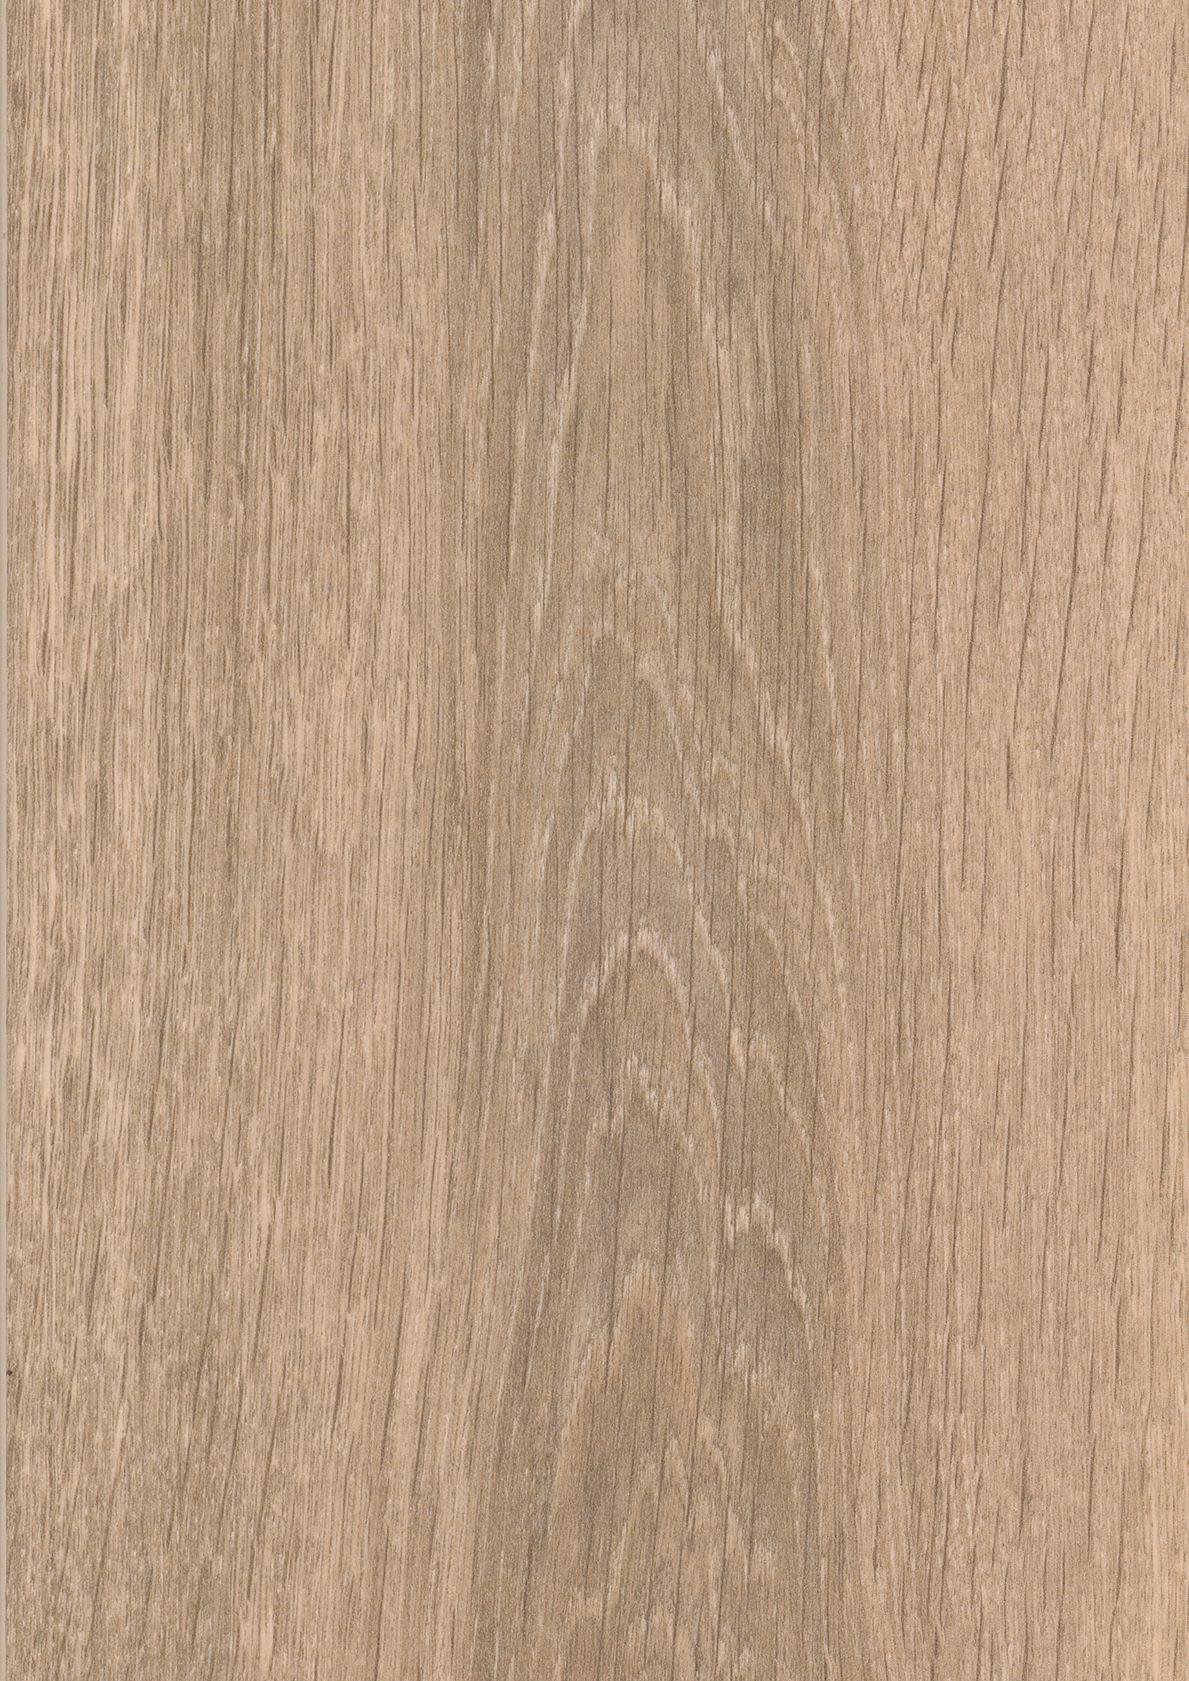 Living T Valencia Oak Laminate Flooring Lansdowne Boards